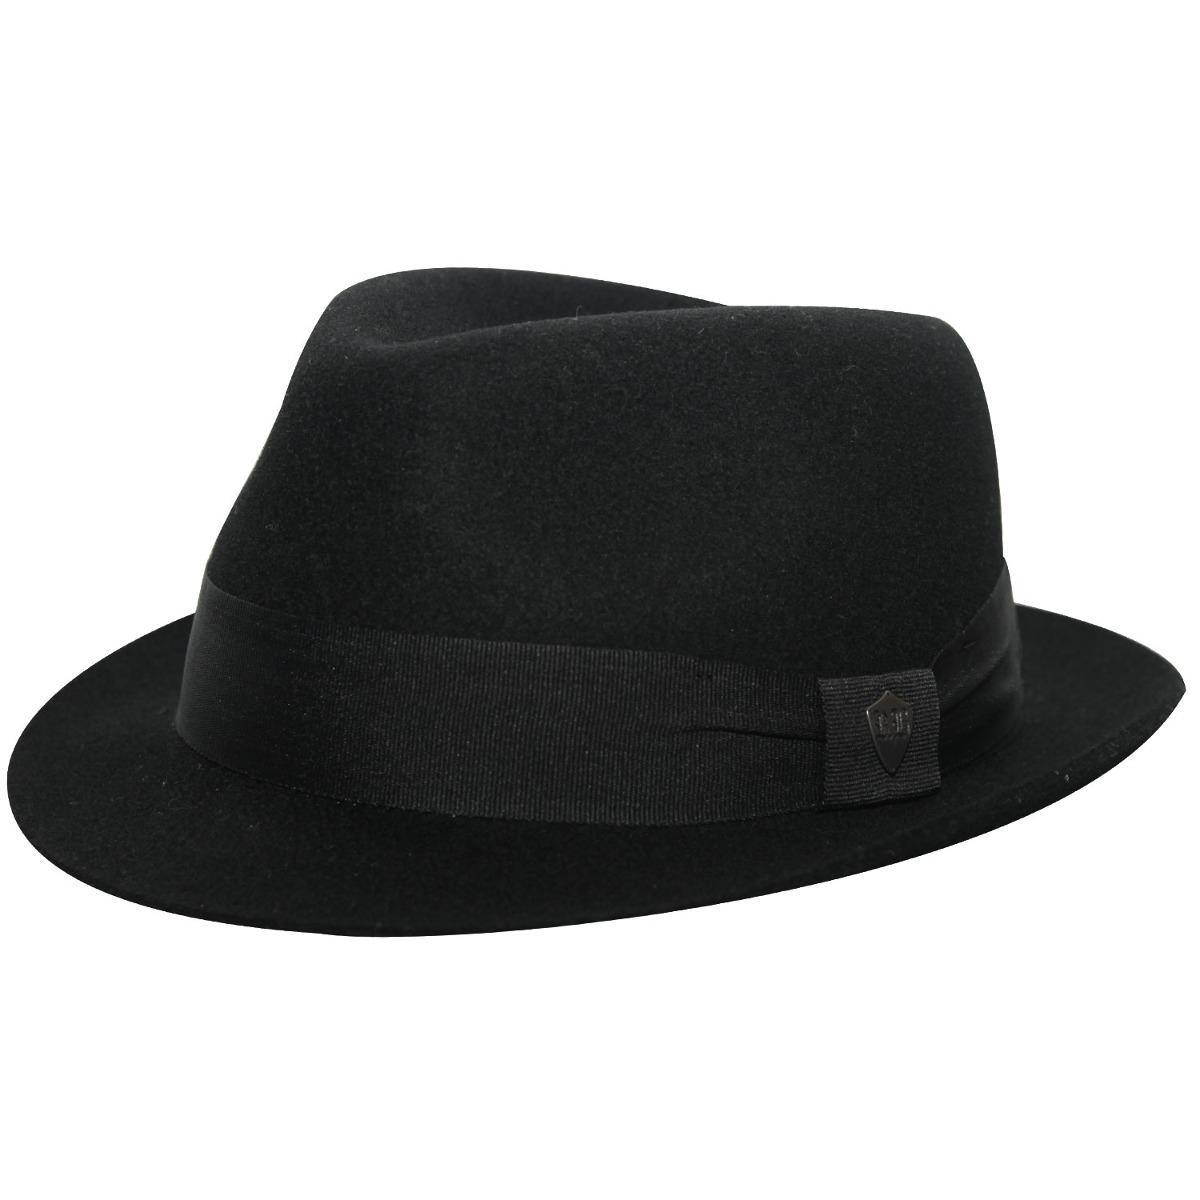 cffc02044ff31 chapéu fedora aba curta preto masculino. Carregando zoom.